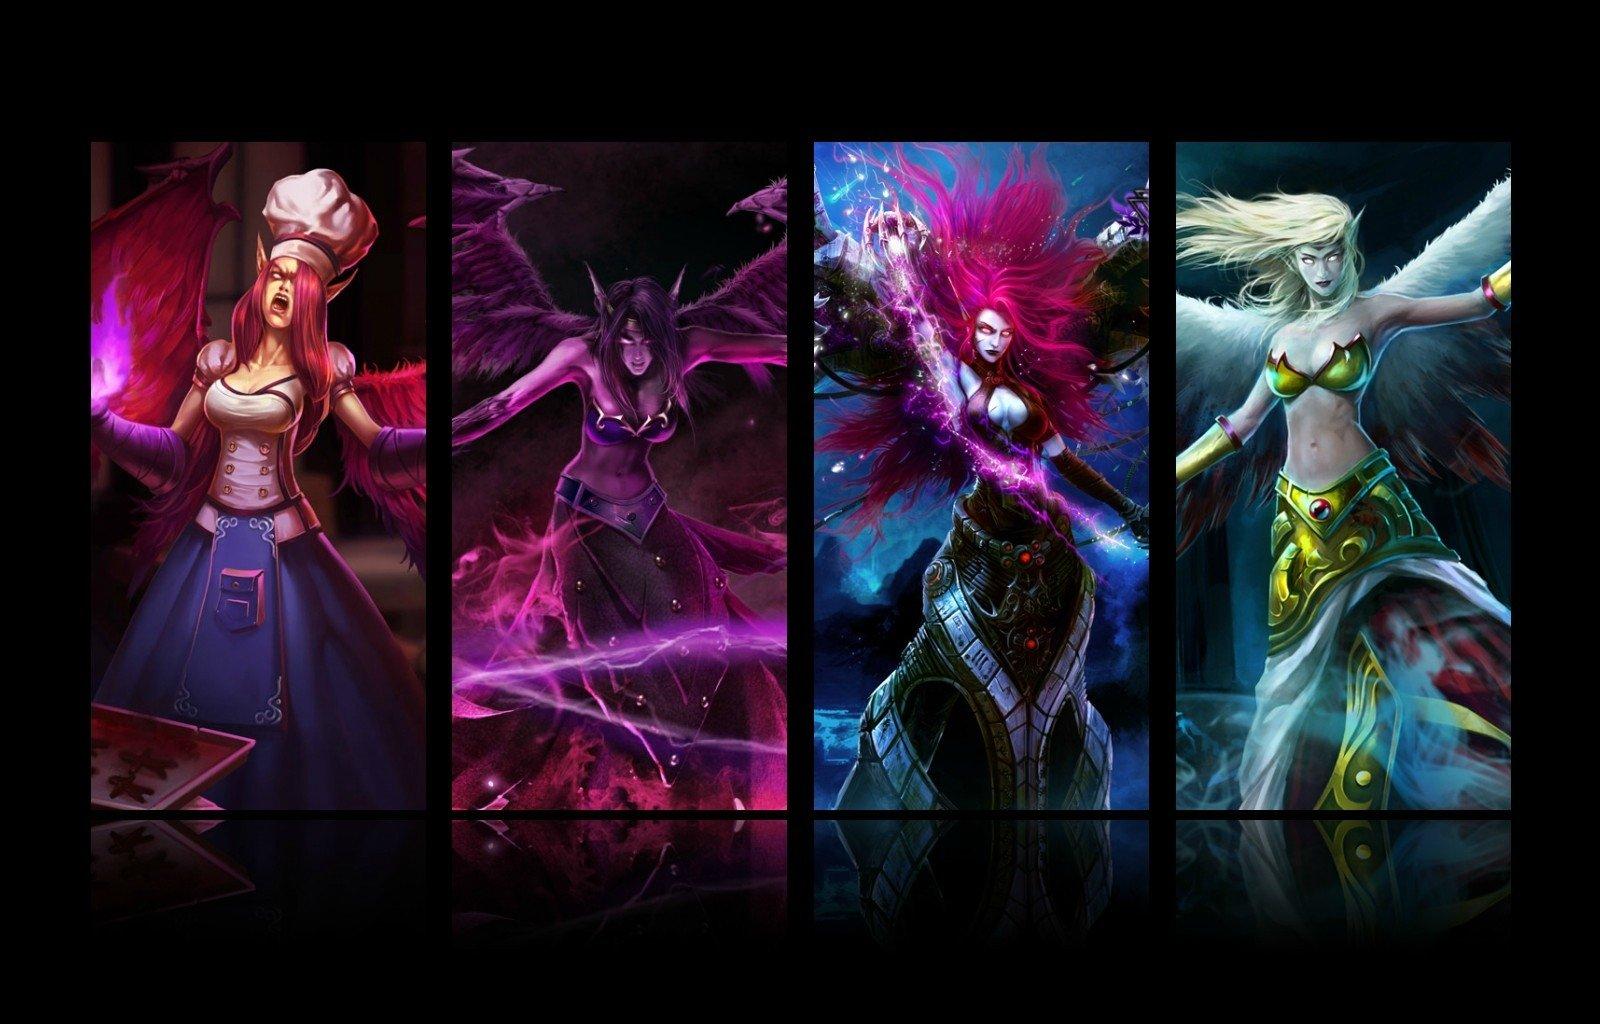 Video Game - League Of Legends  Morgana (League Of Legends) Wallpaper